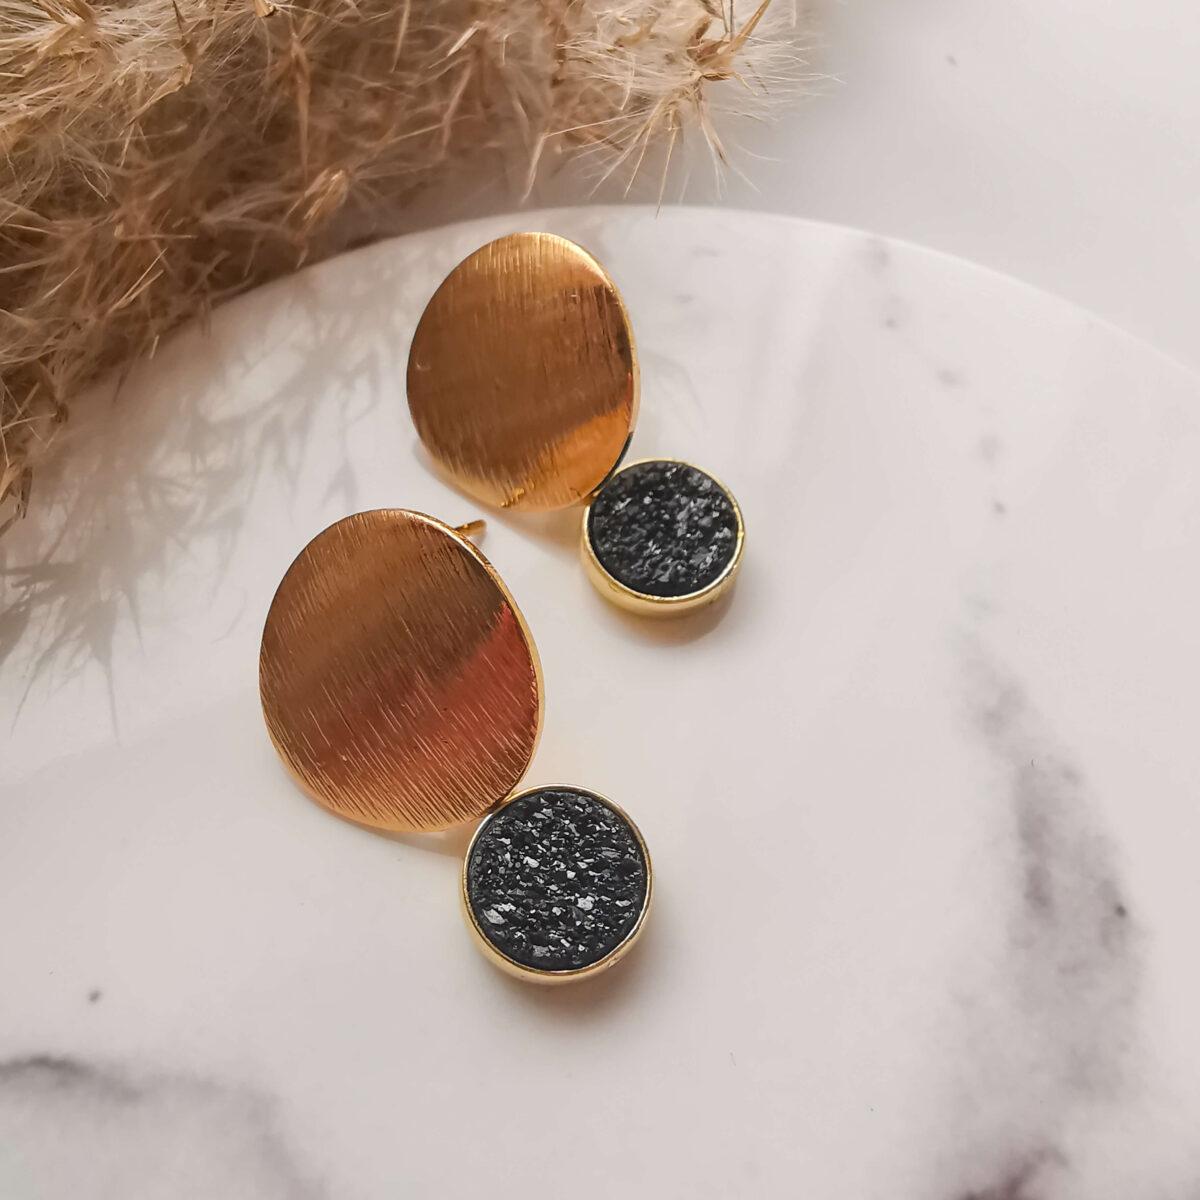 AccentsUK - Small Black Druzy Earrins